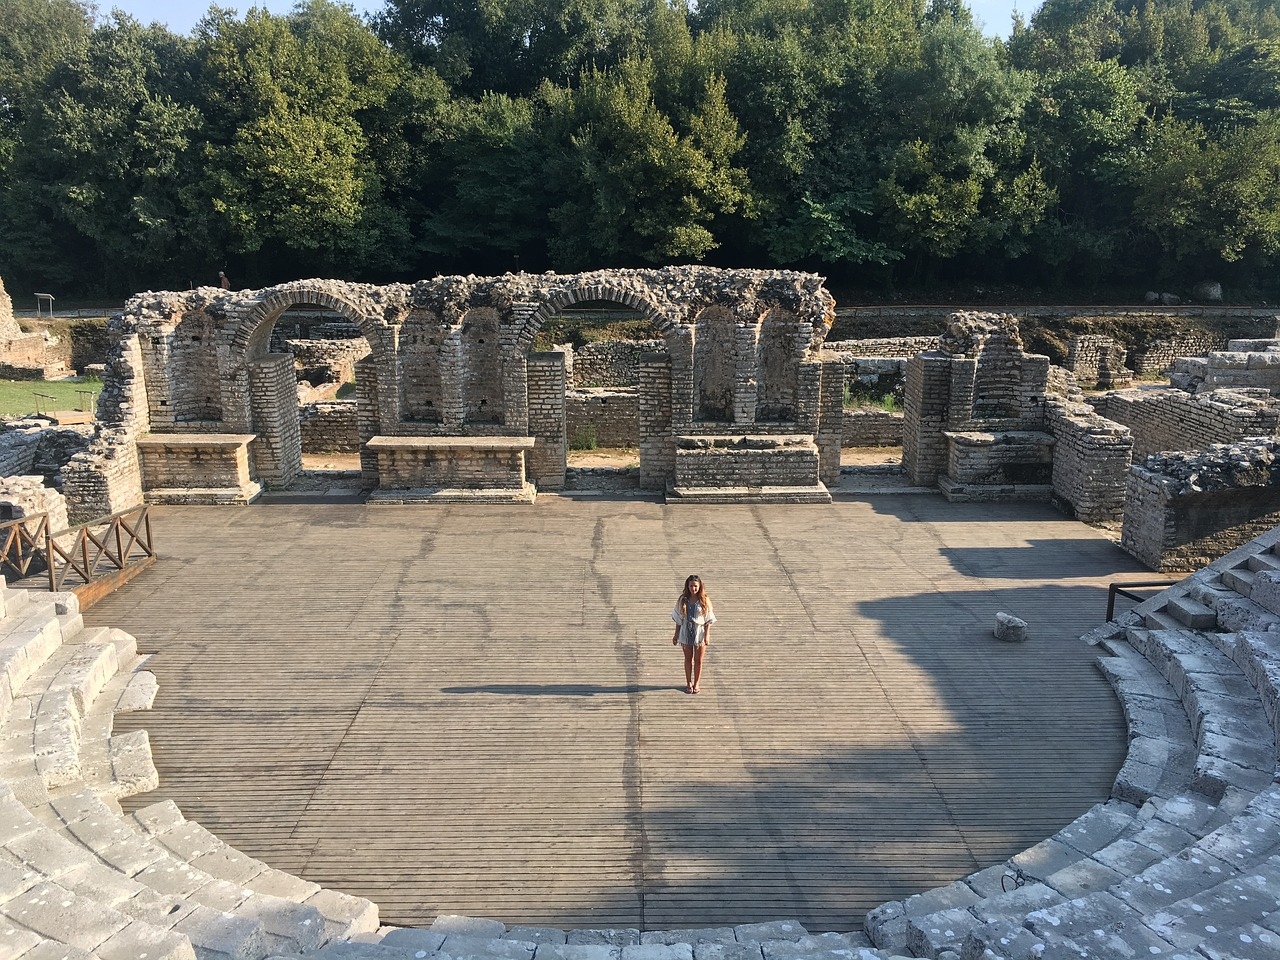 Ferienhaus Albanien - Weltkulturerbe Butrint